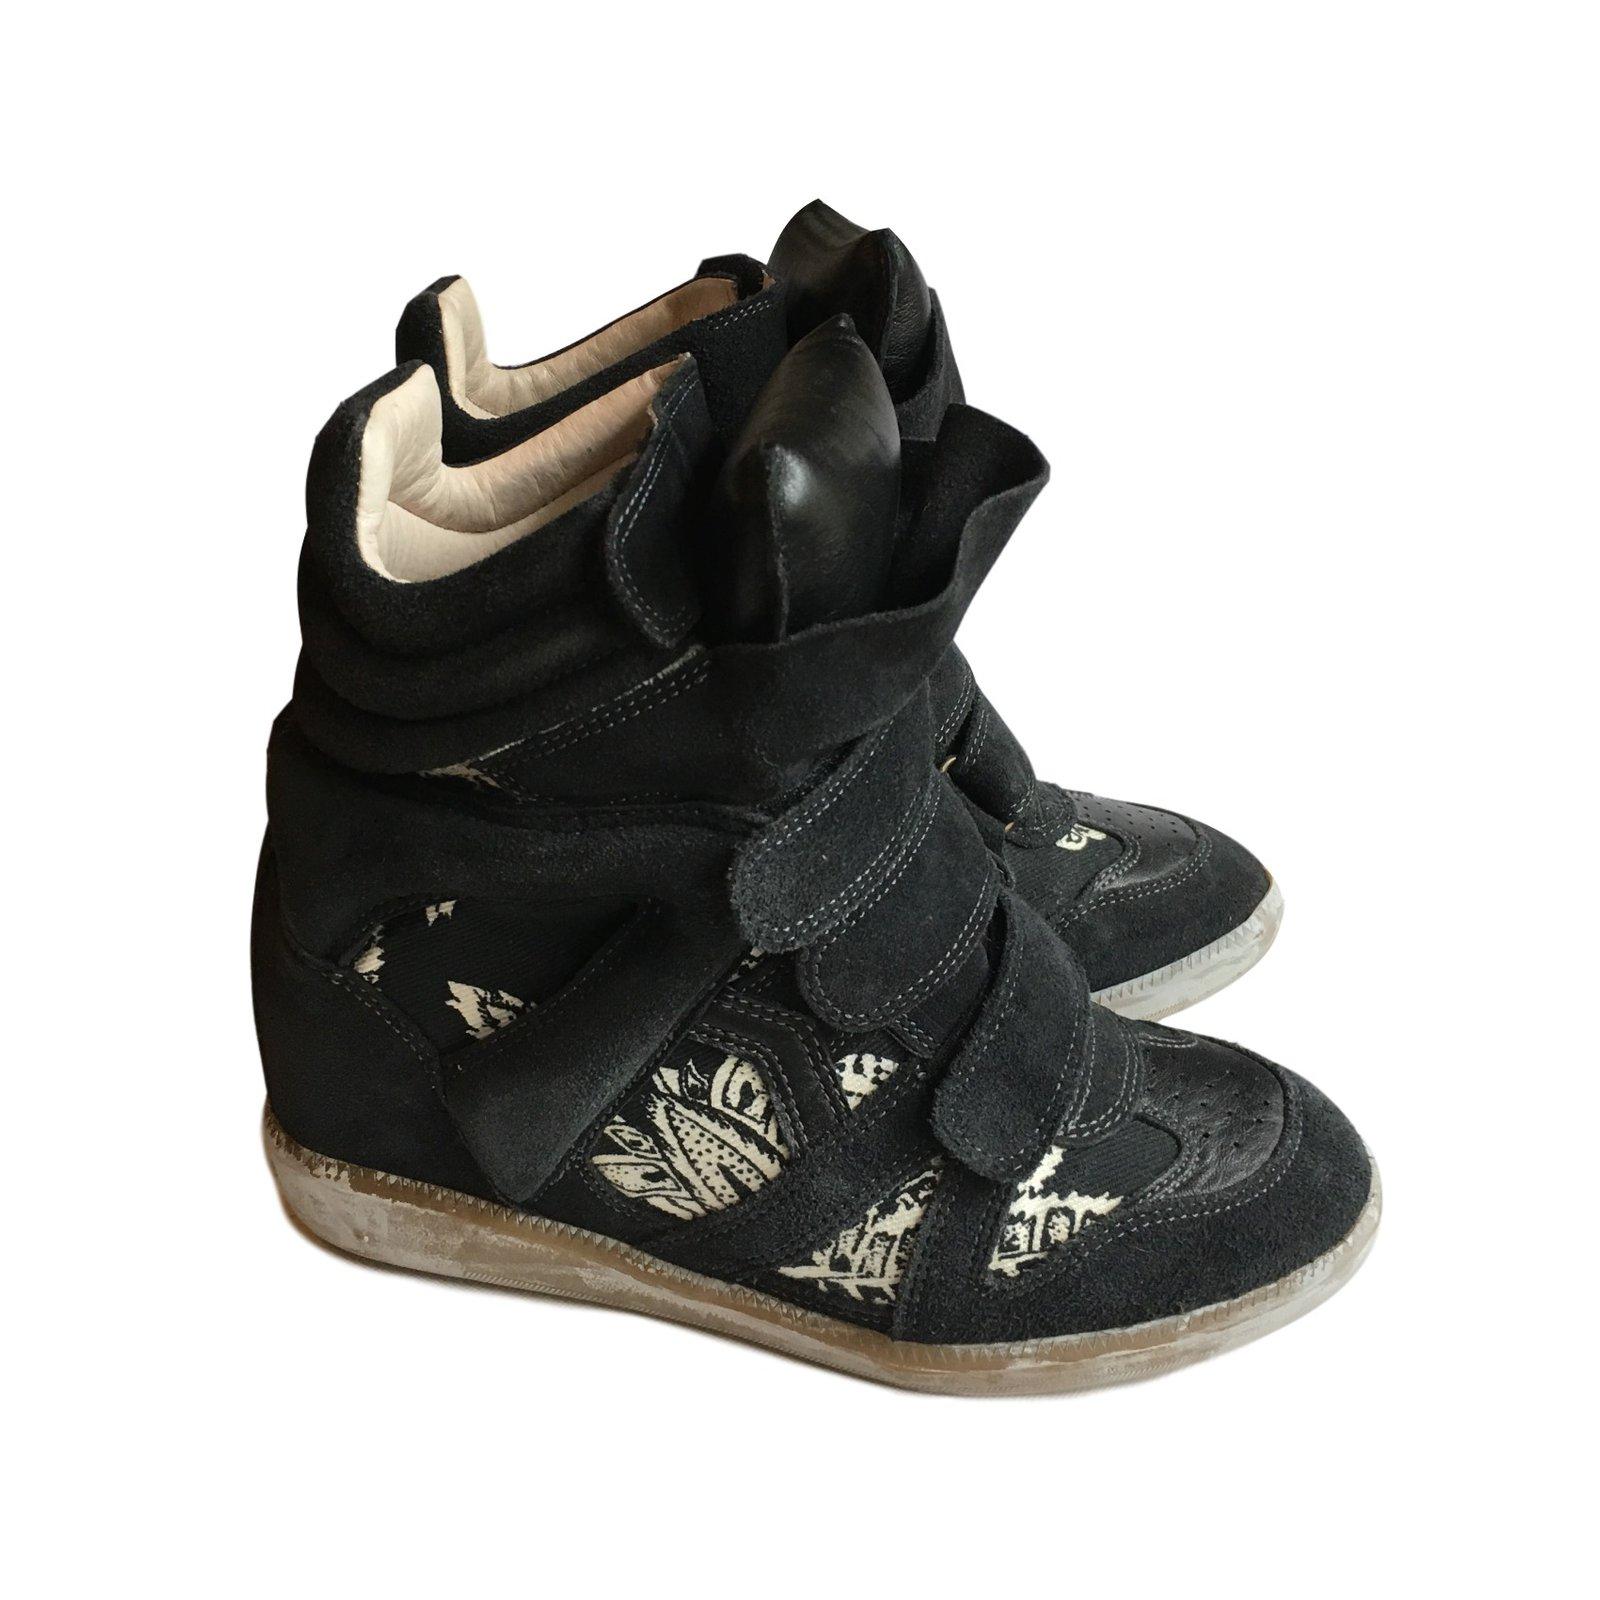 Isabel Marant Bekett Sneakers Leather